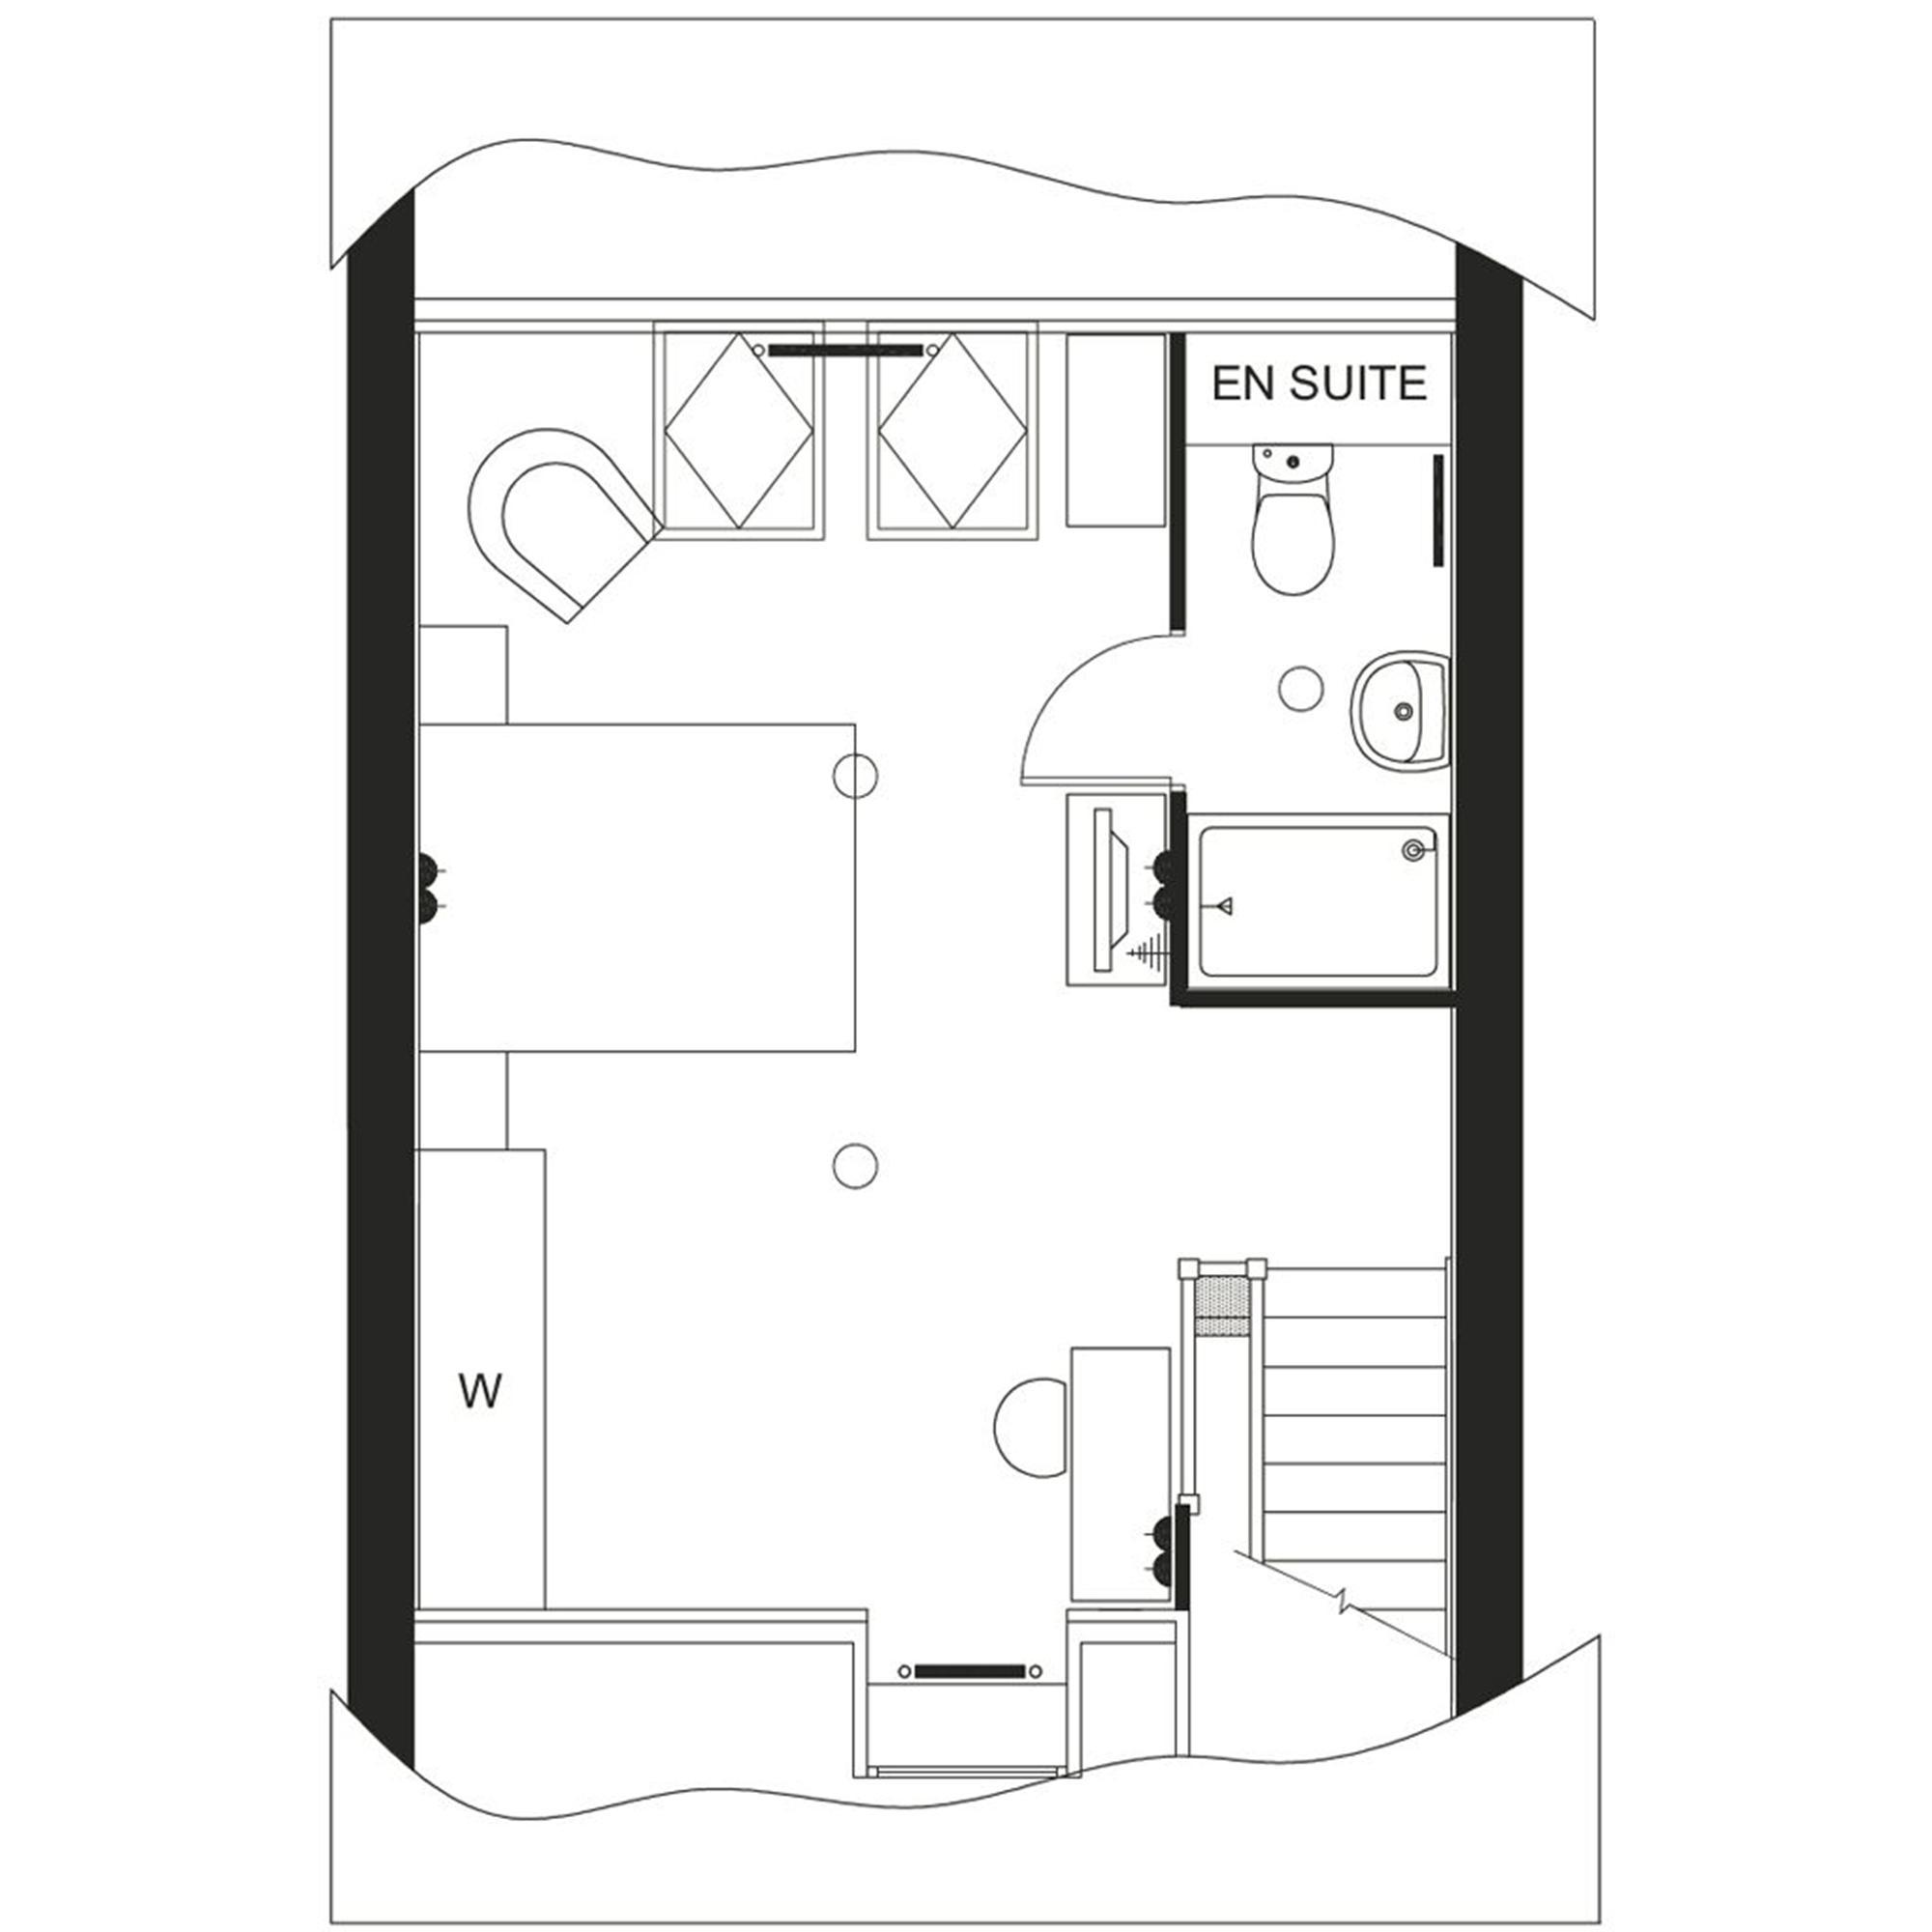 david wilson homes floor plans for sale swanbourne park roundstone lane angmering west